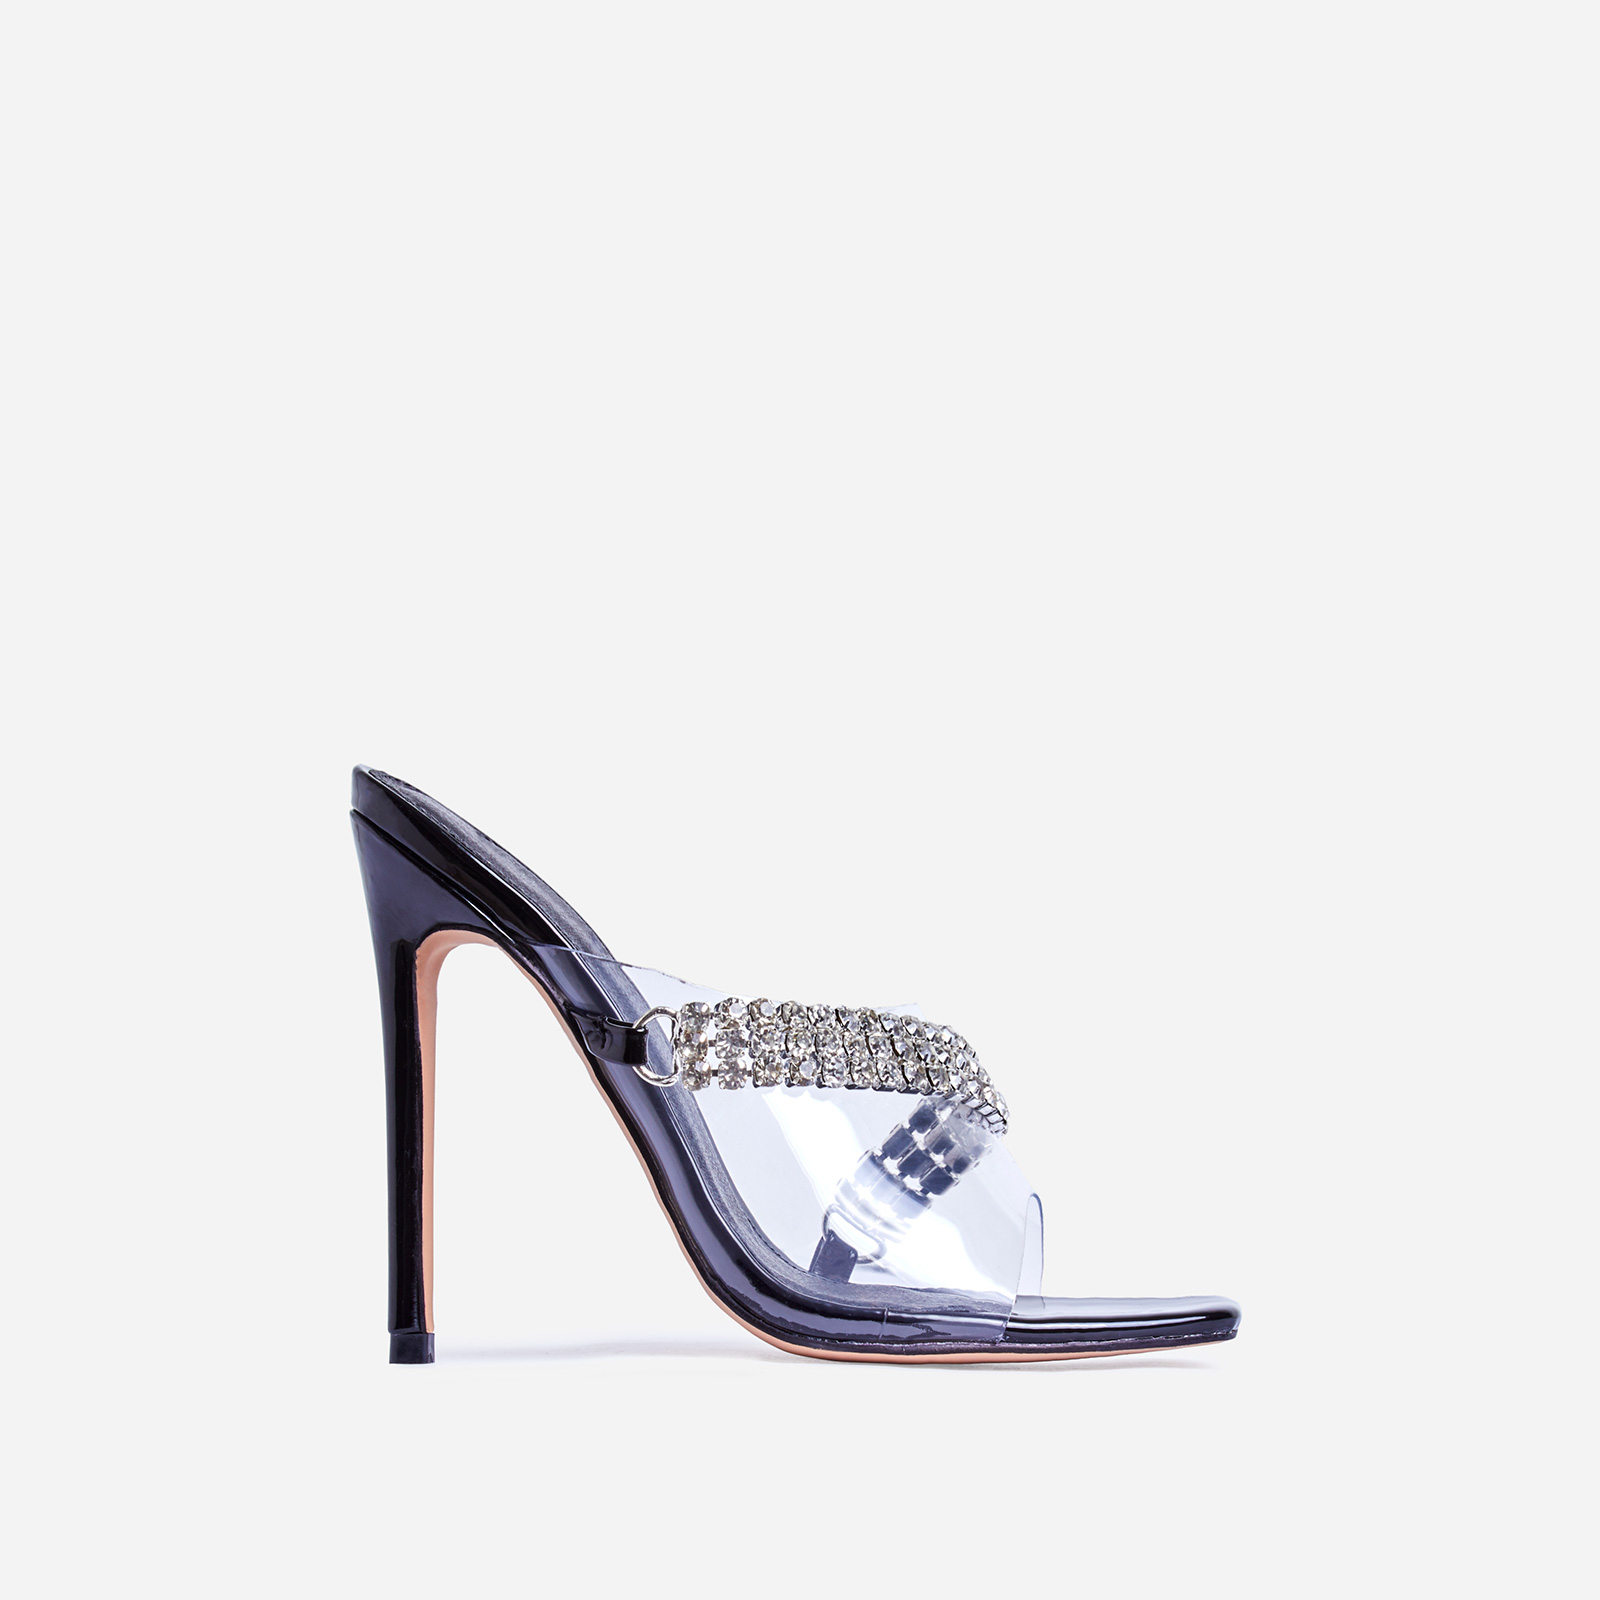 Peggy Diamante Detail  Square Peep Toe Heel Mule In Black Patent